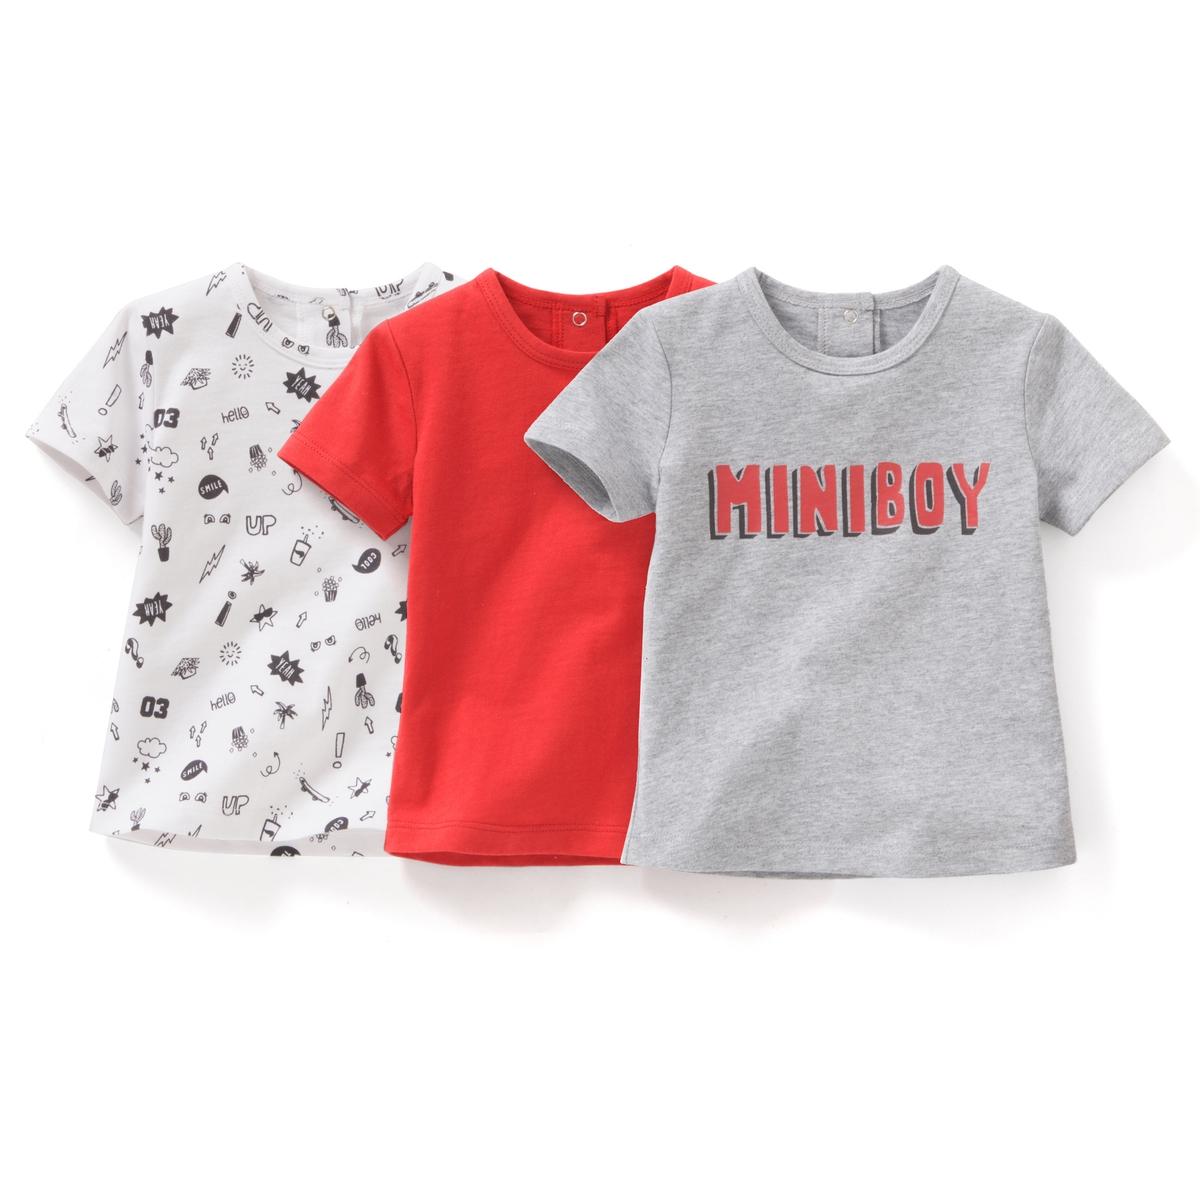 3 футболки с короткими рукавами 1 мес-3 лет